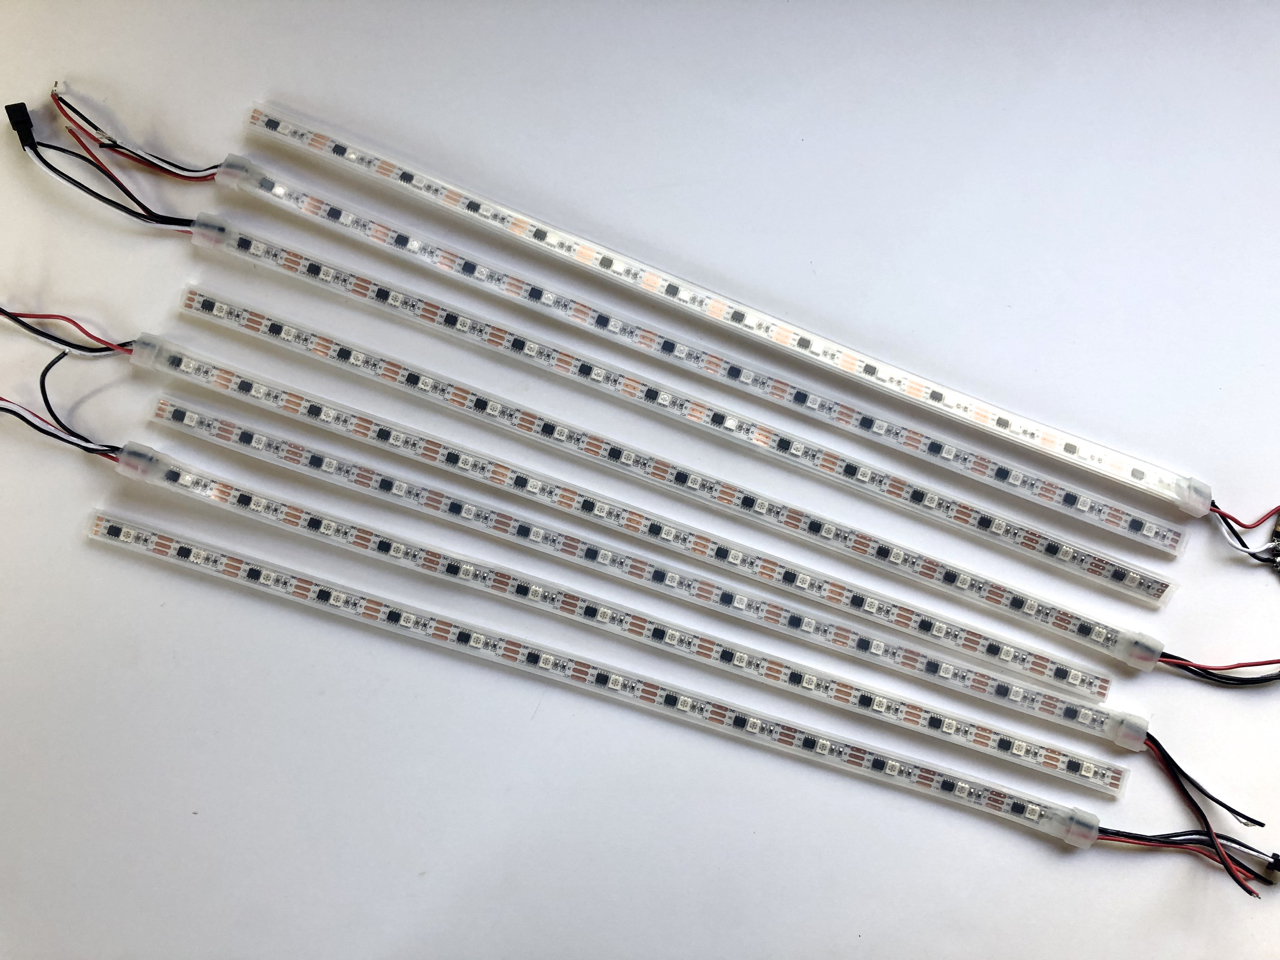 led_strips_01_cutstrips.jpg